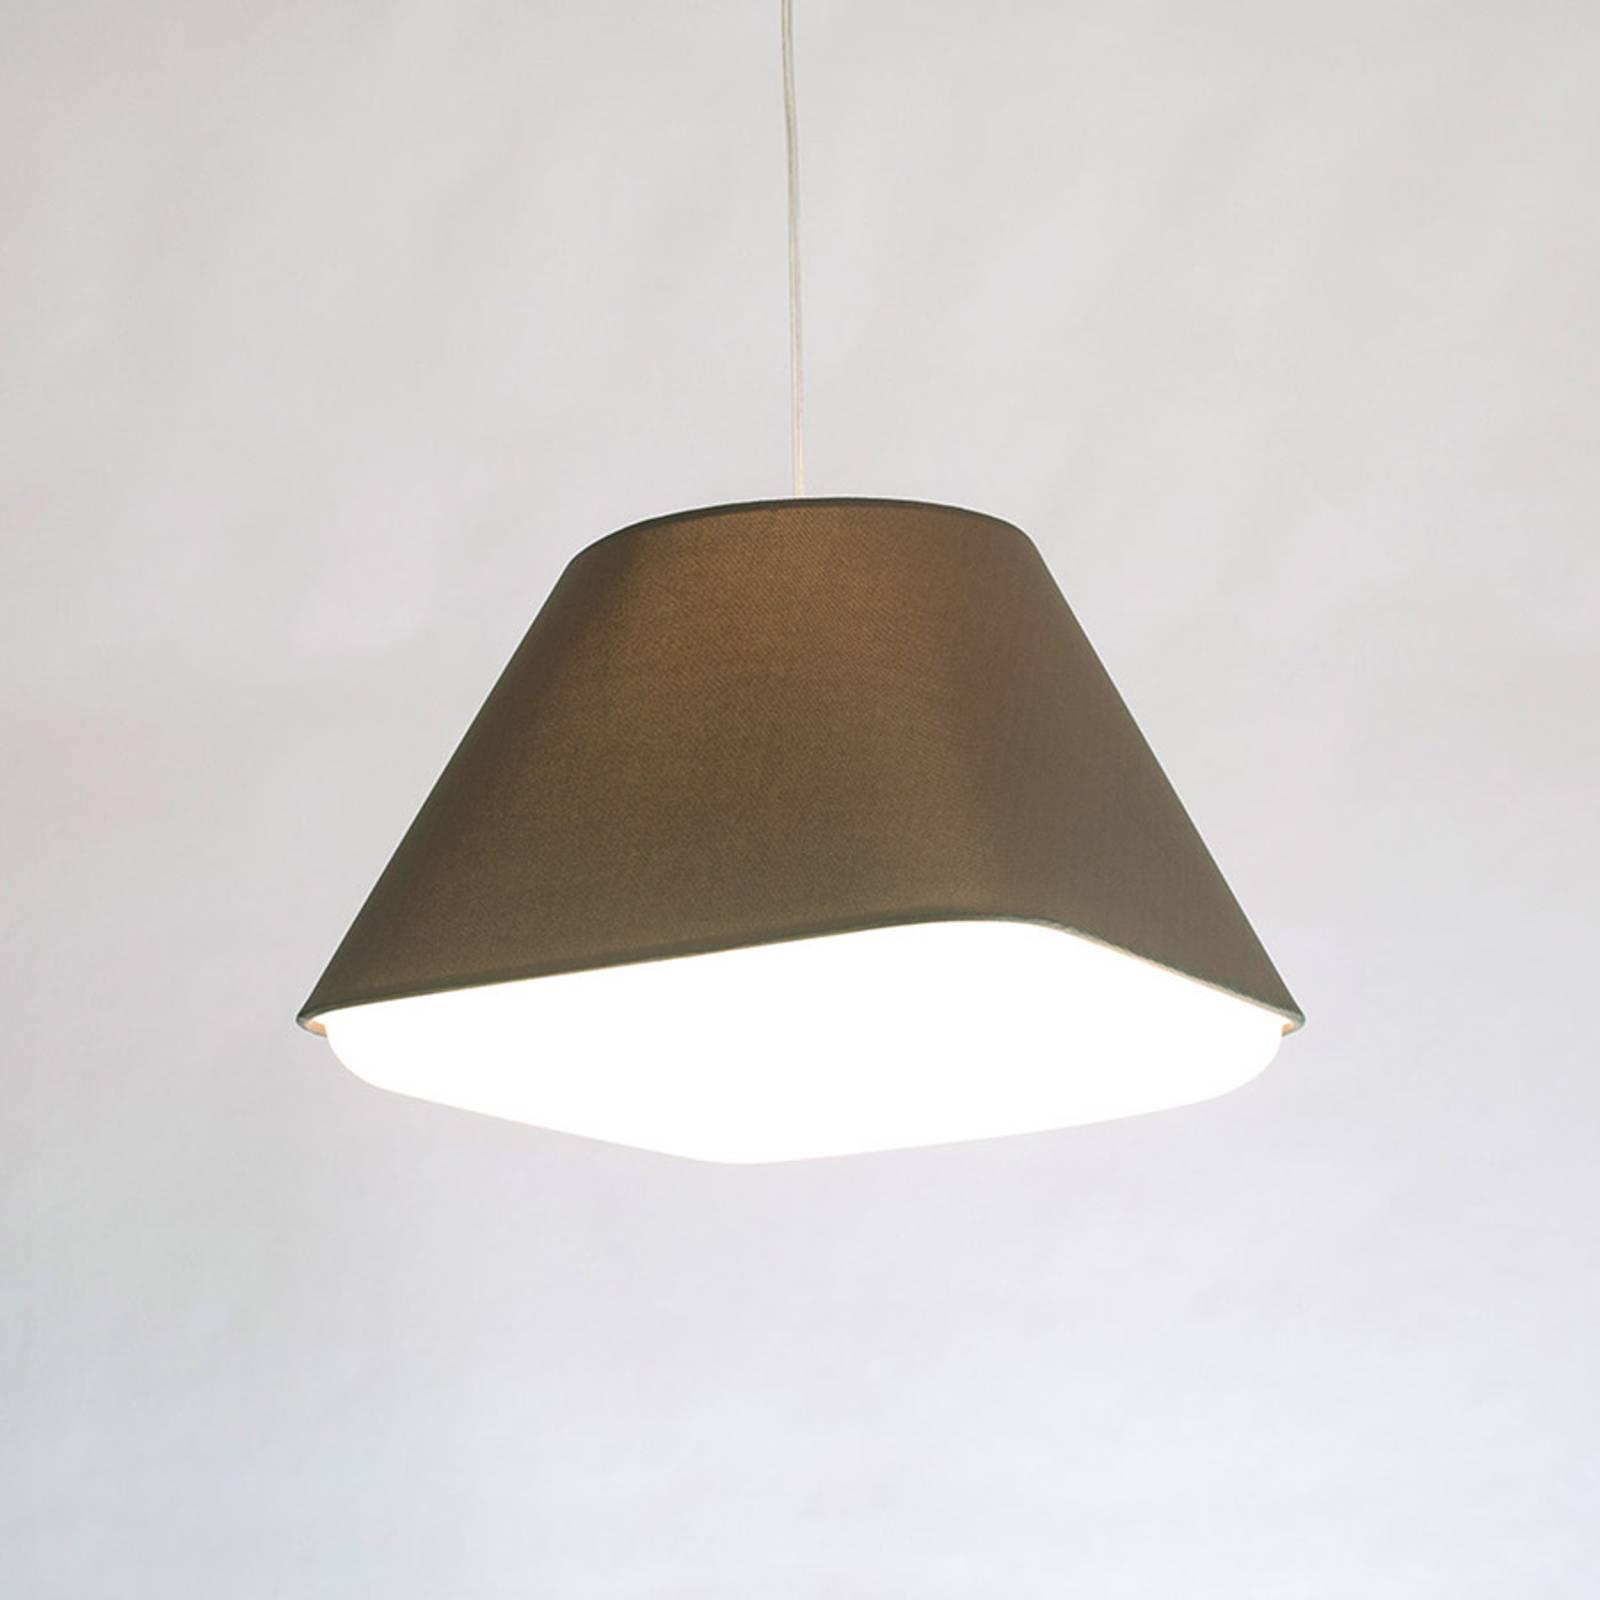 Innermost RD2SQ 40 - lampa wisząca ciepła szarość